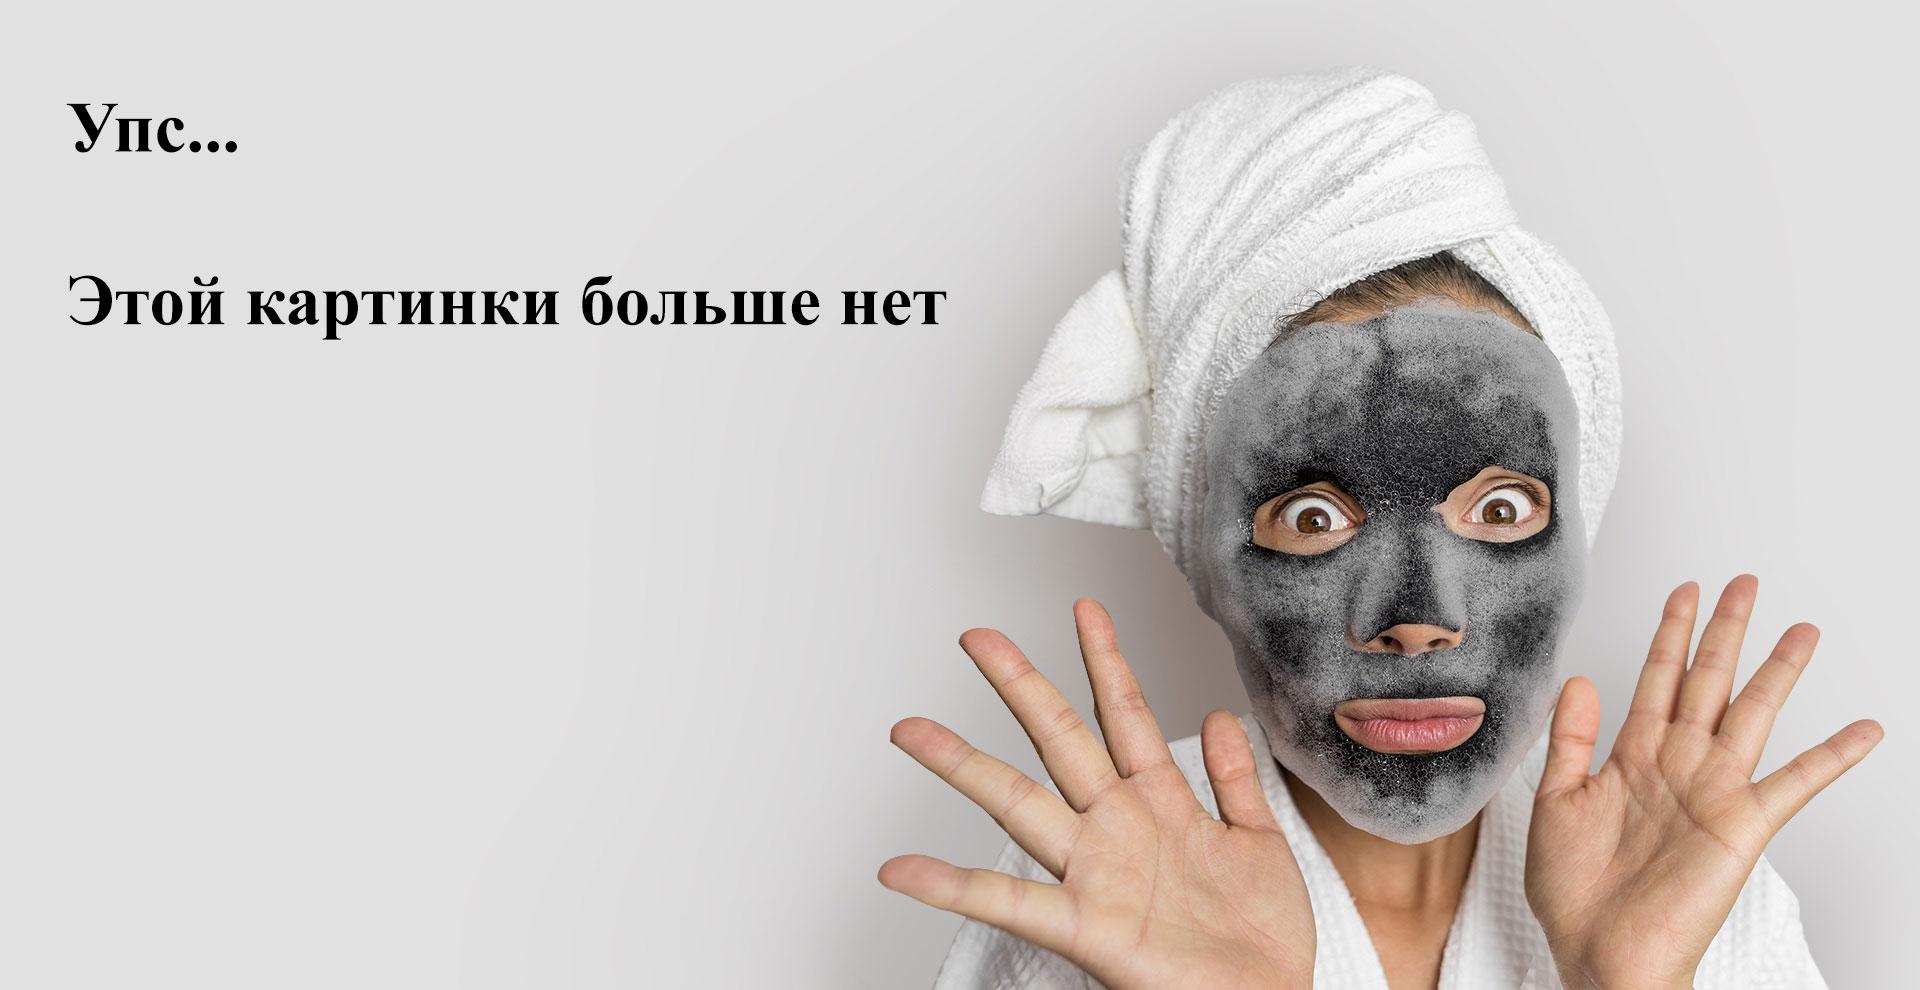 Vivienne Sabo, Подводка для глаз Cabaret Premiere, тон 01